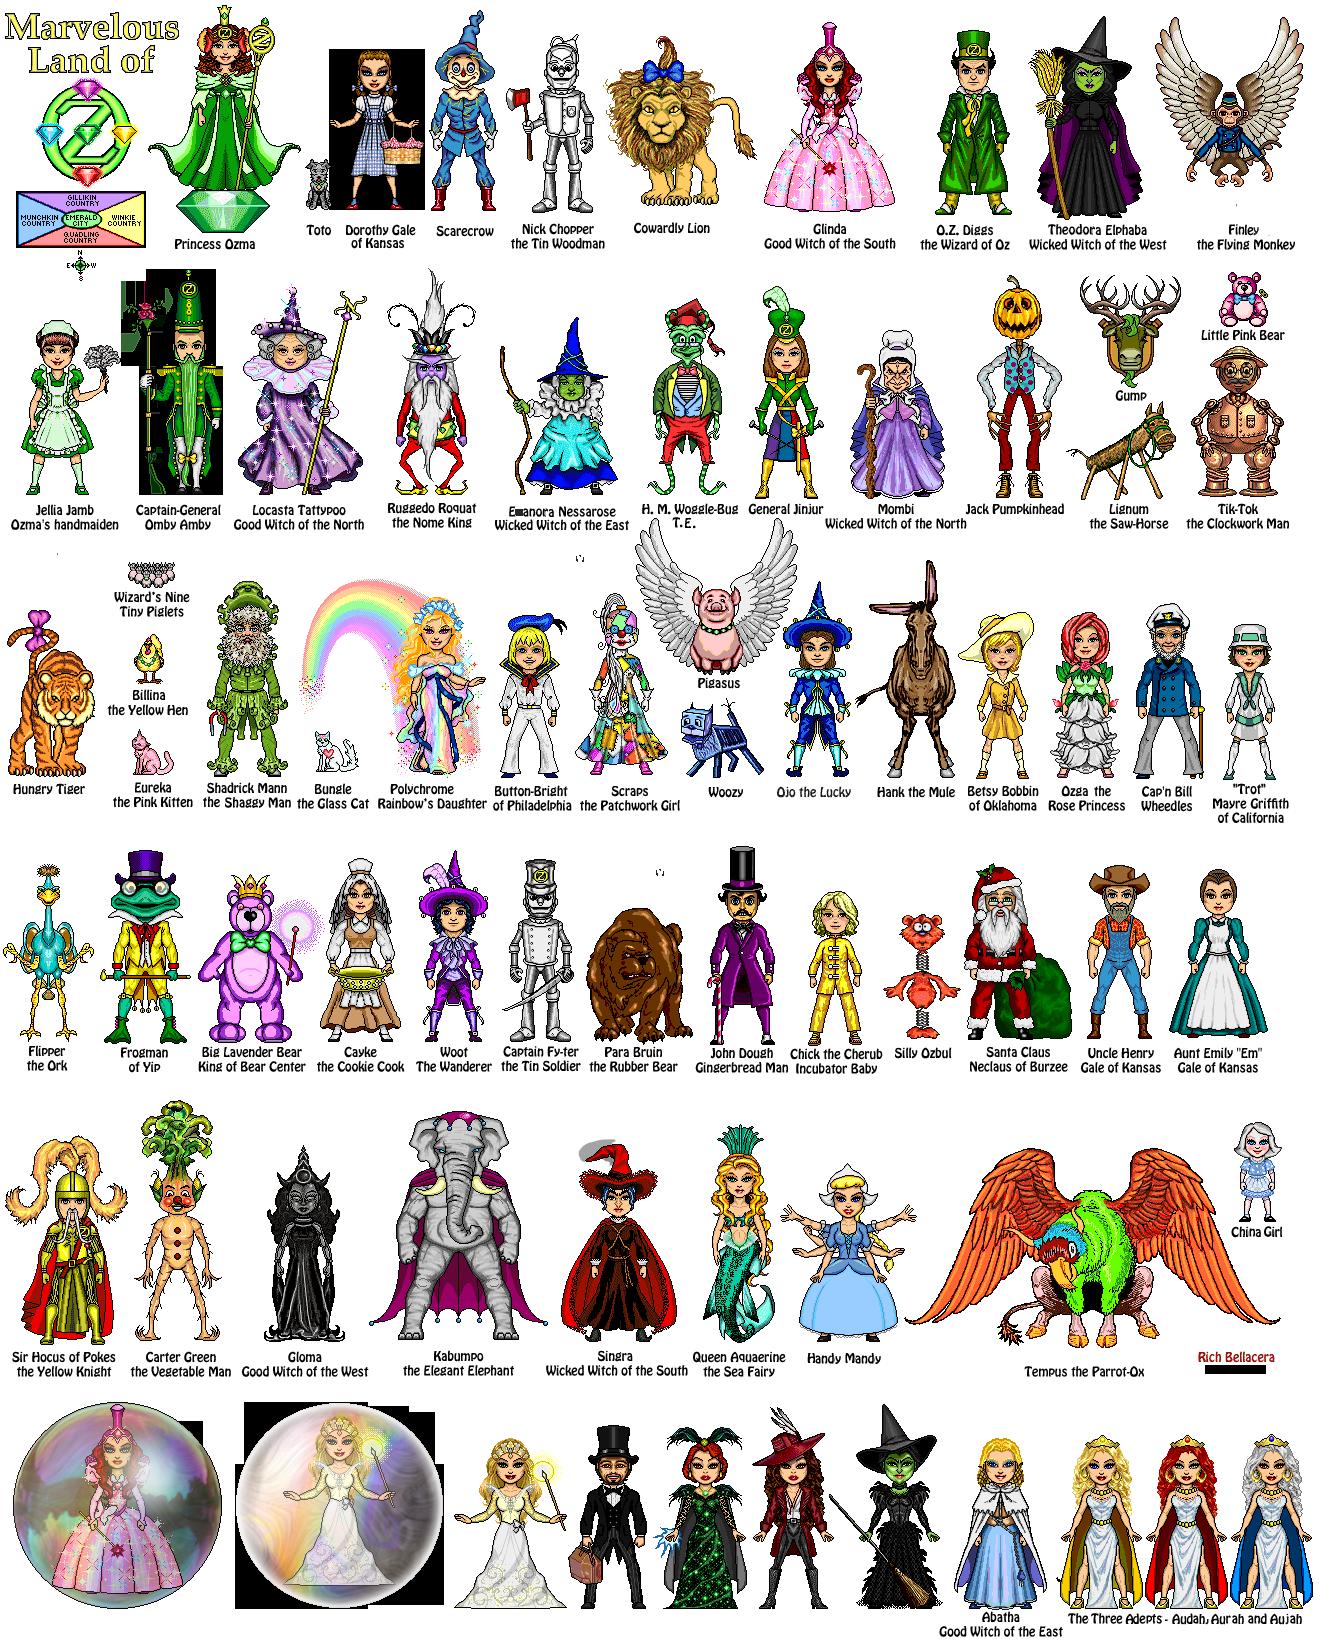 Oz Characters - 1.12 MB